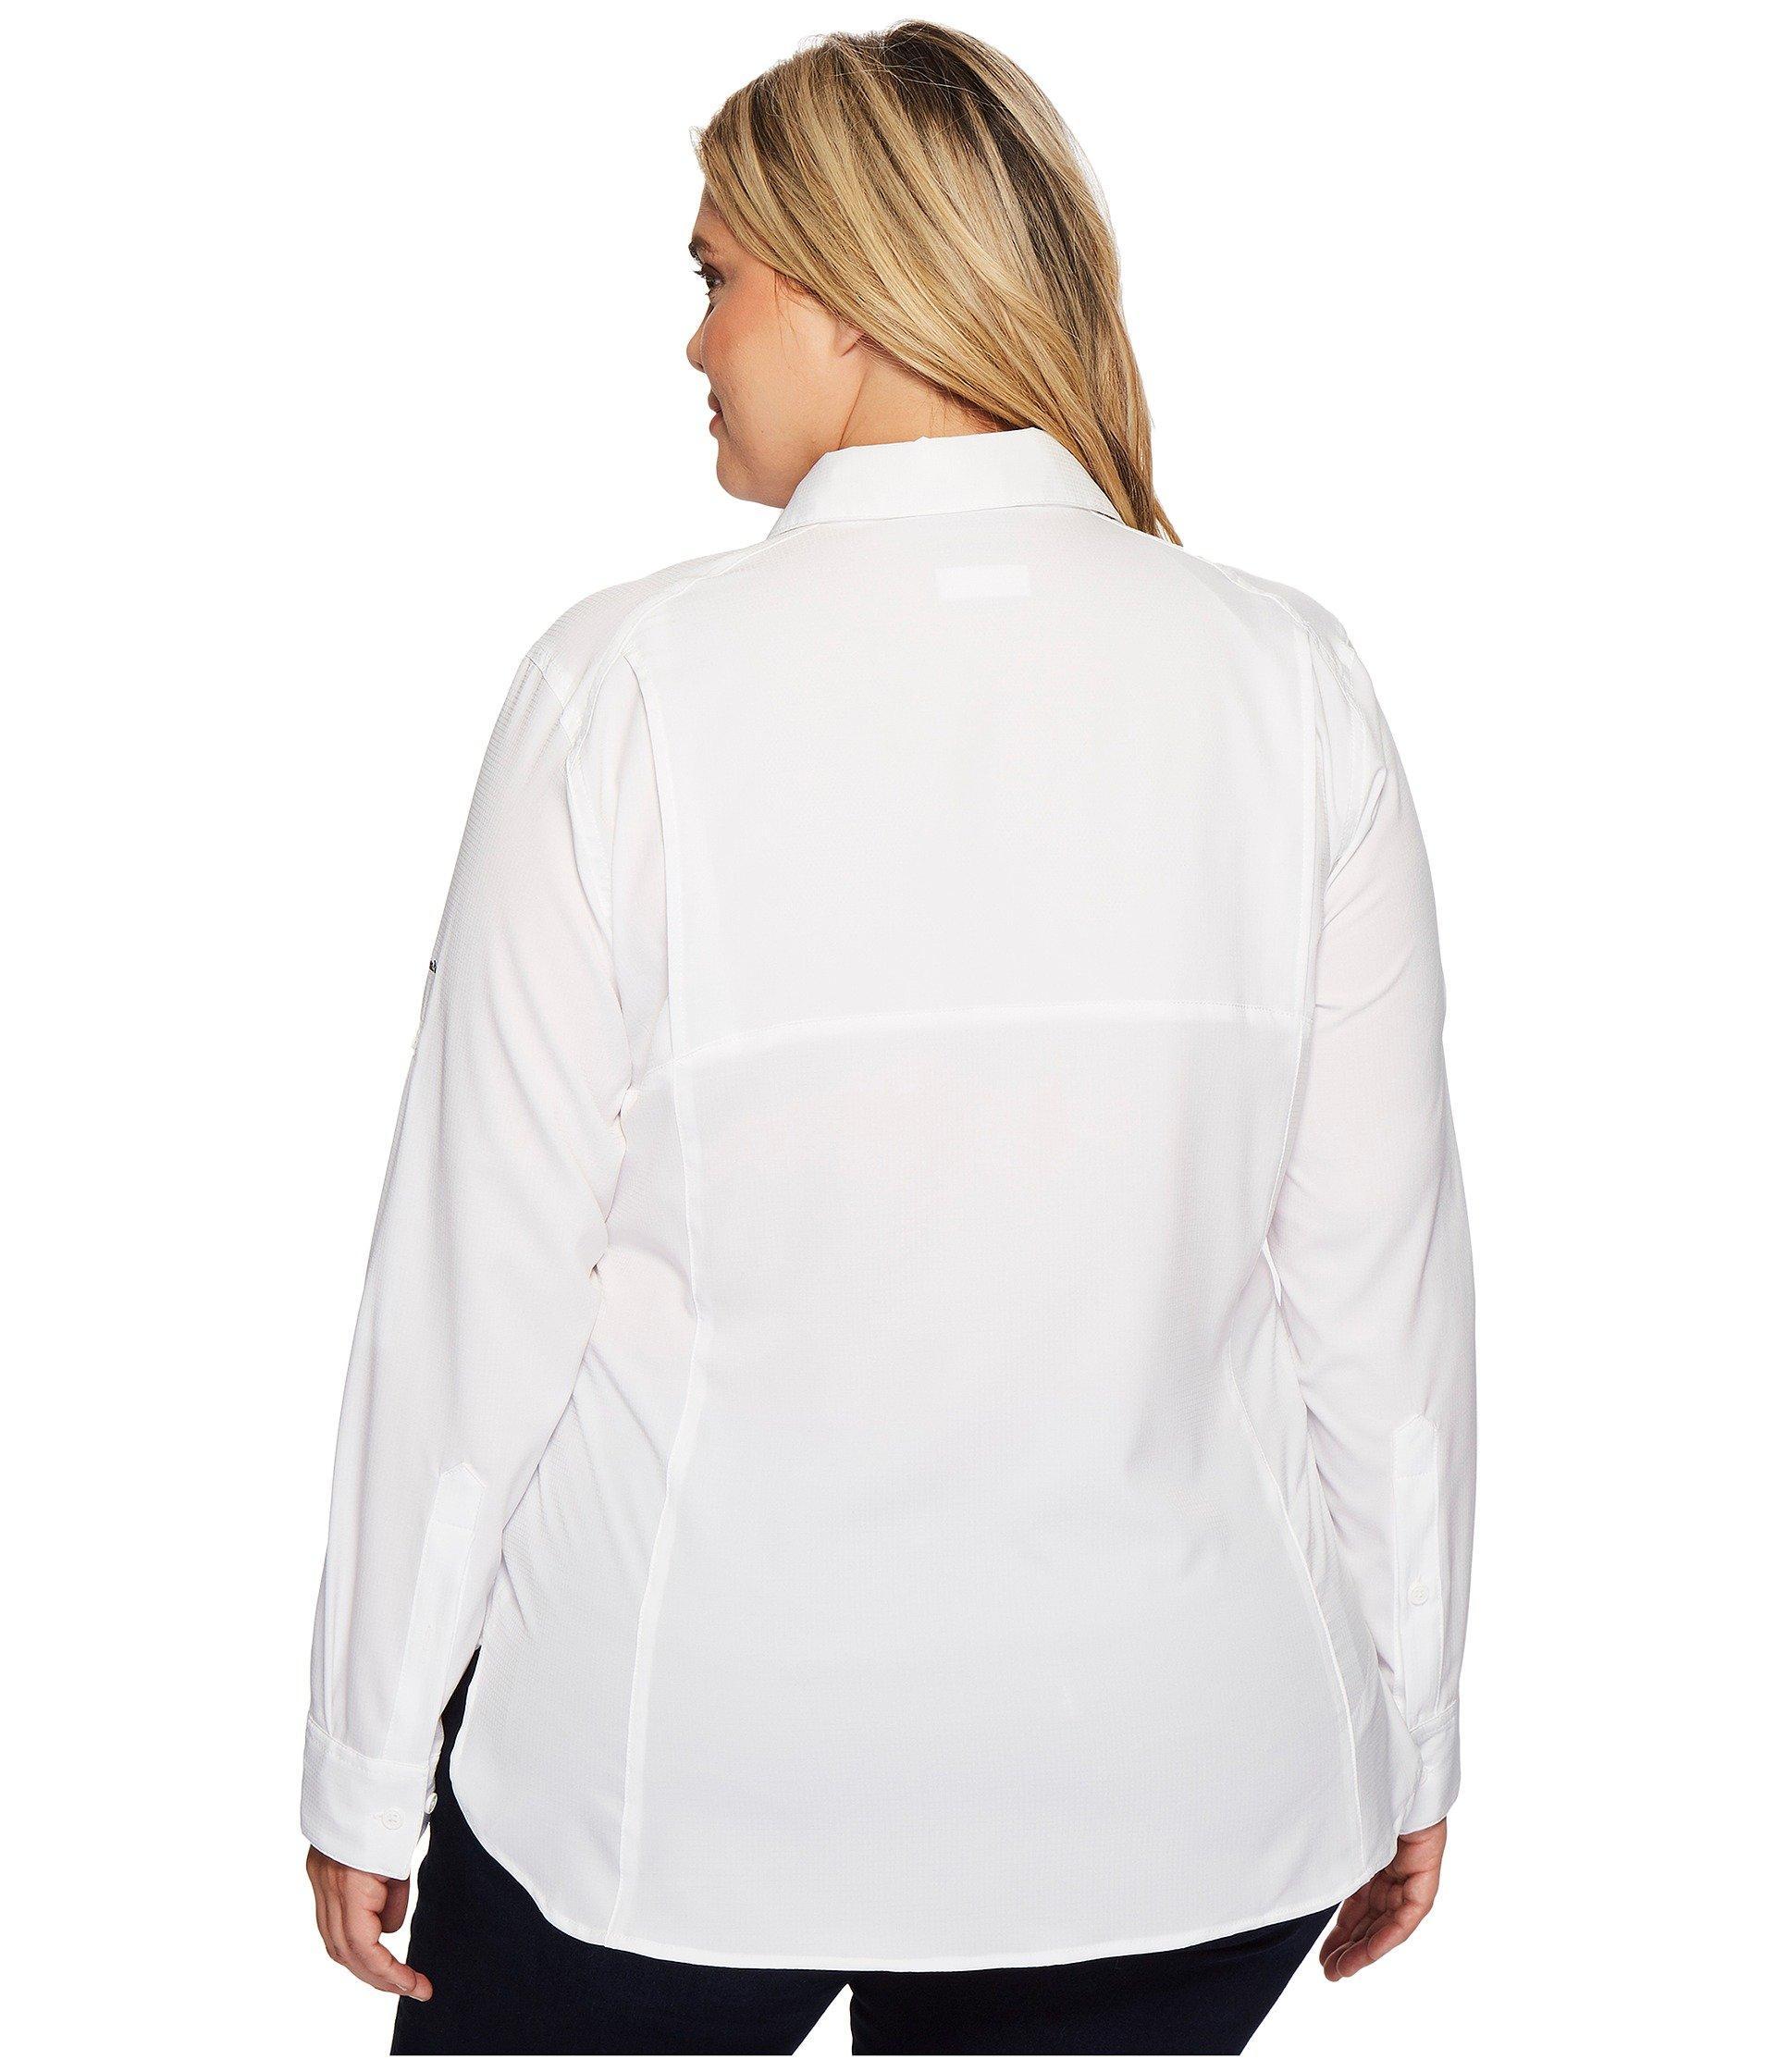 6feafdd2cbb Columbia - White Plus Size Silver Ridge Lite Long Sleeve Shirt (haute Pink)  Women s. View fullscreen